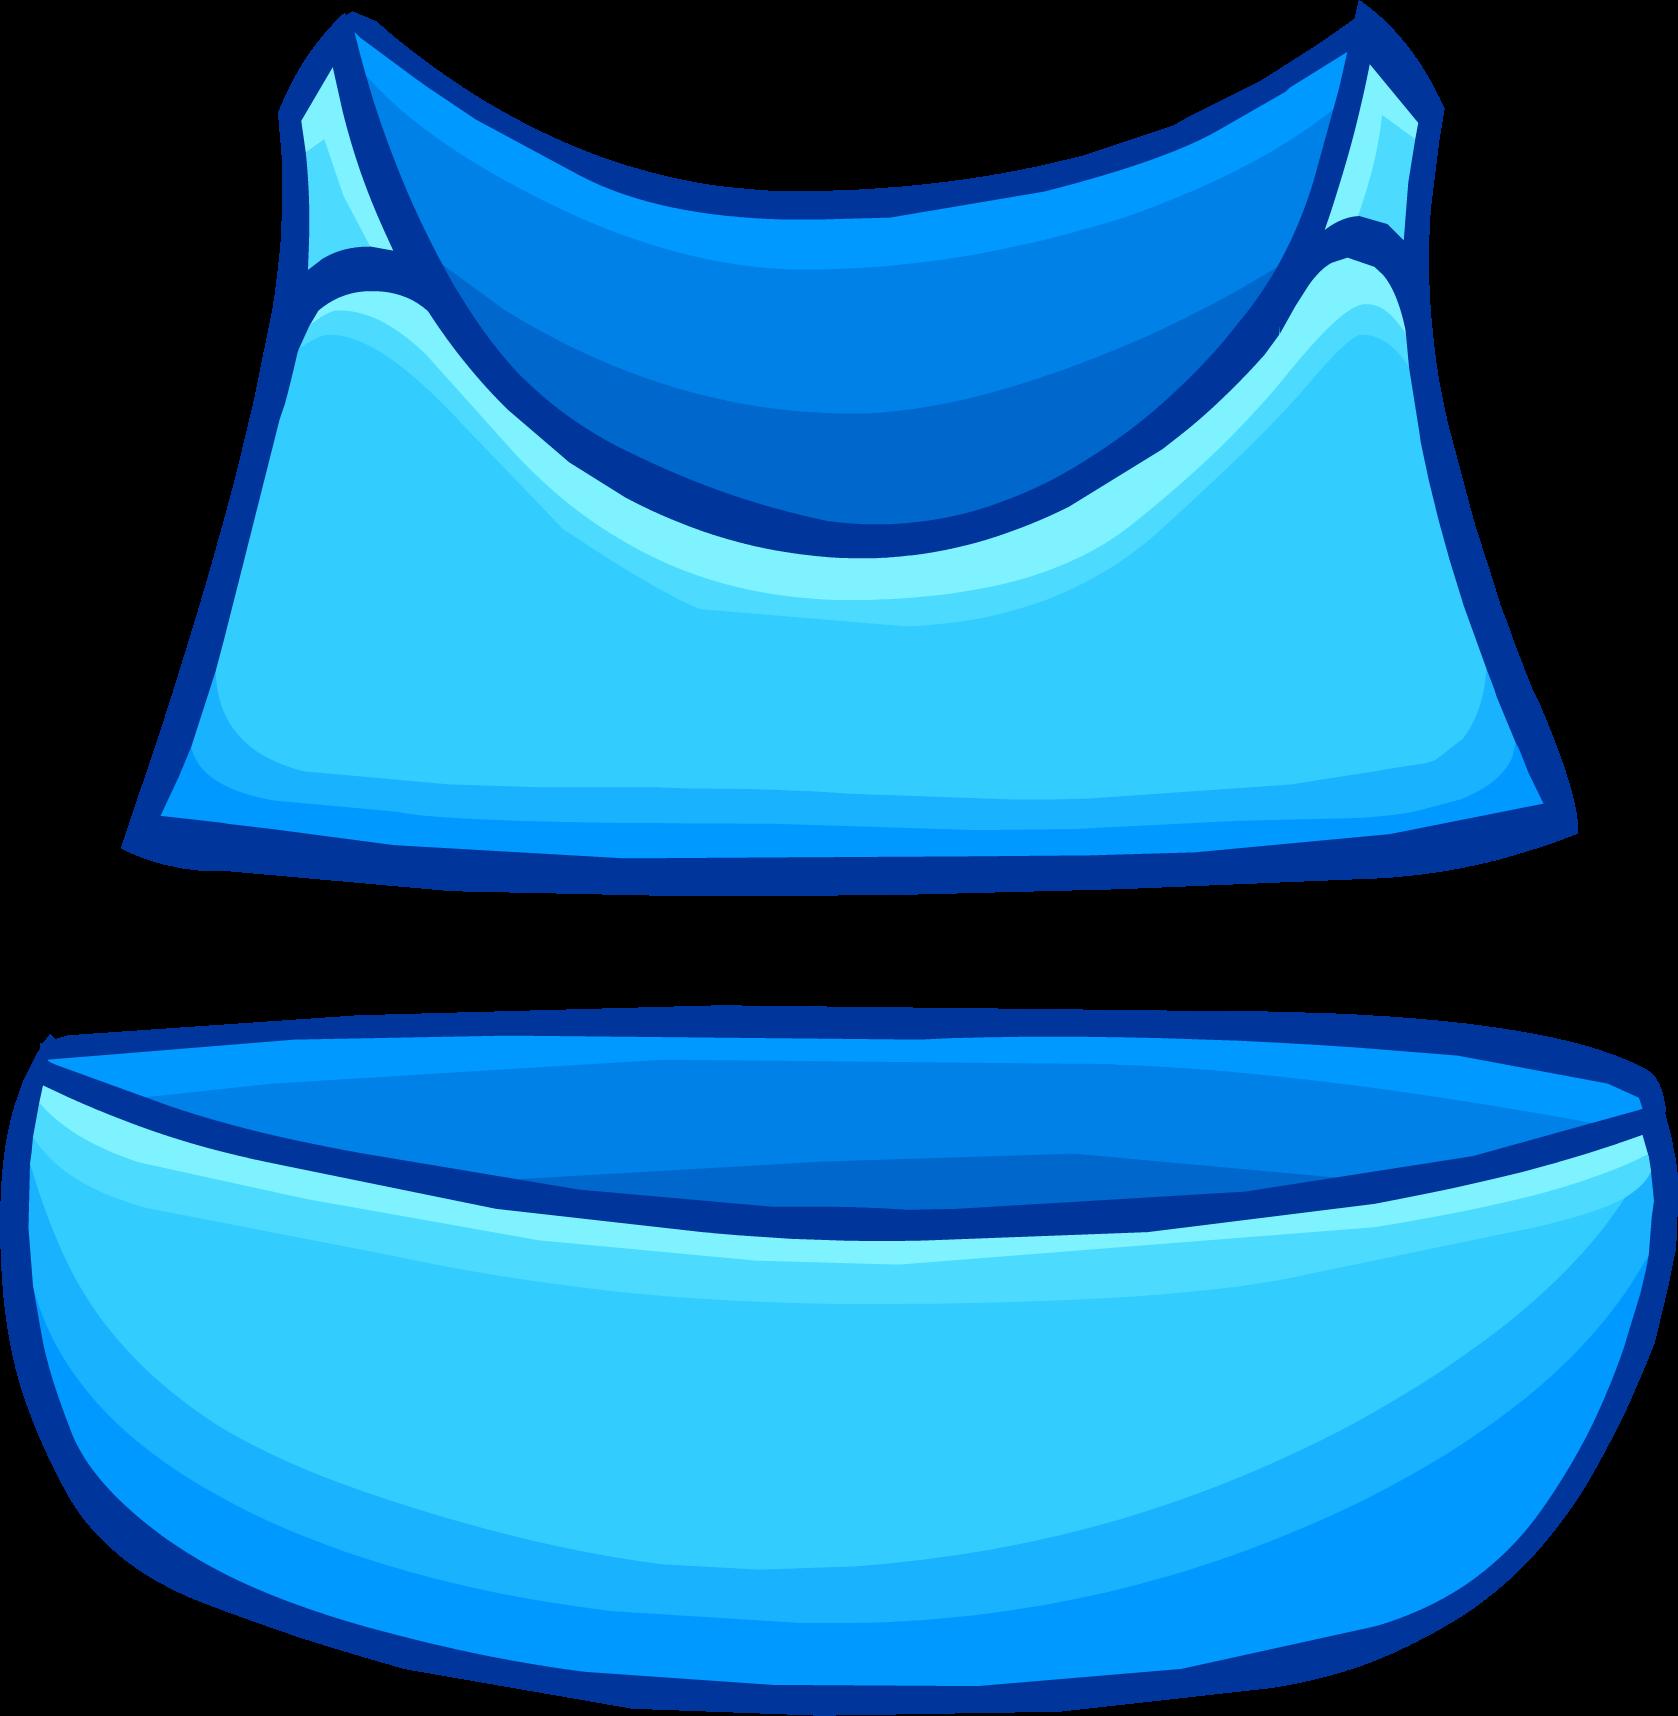 Swimsuit clipart beach clothing. Aqua bikini club penguin